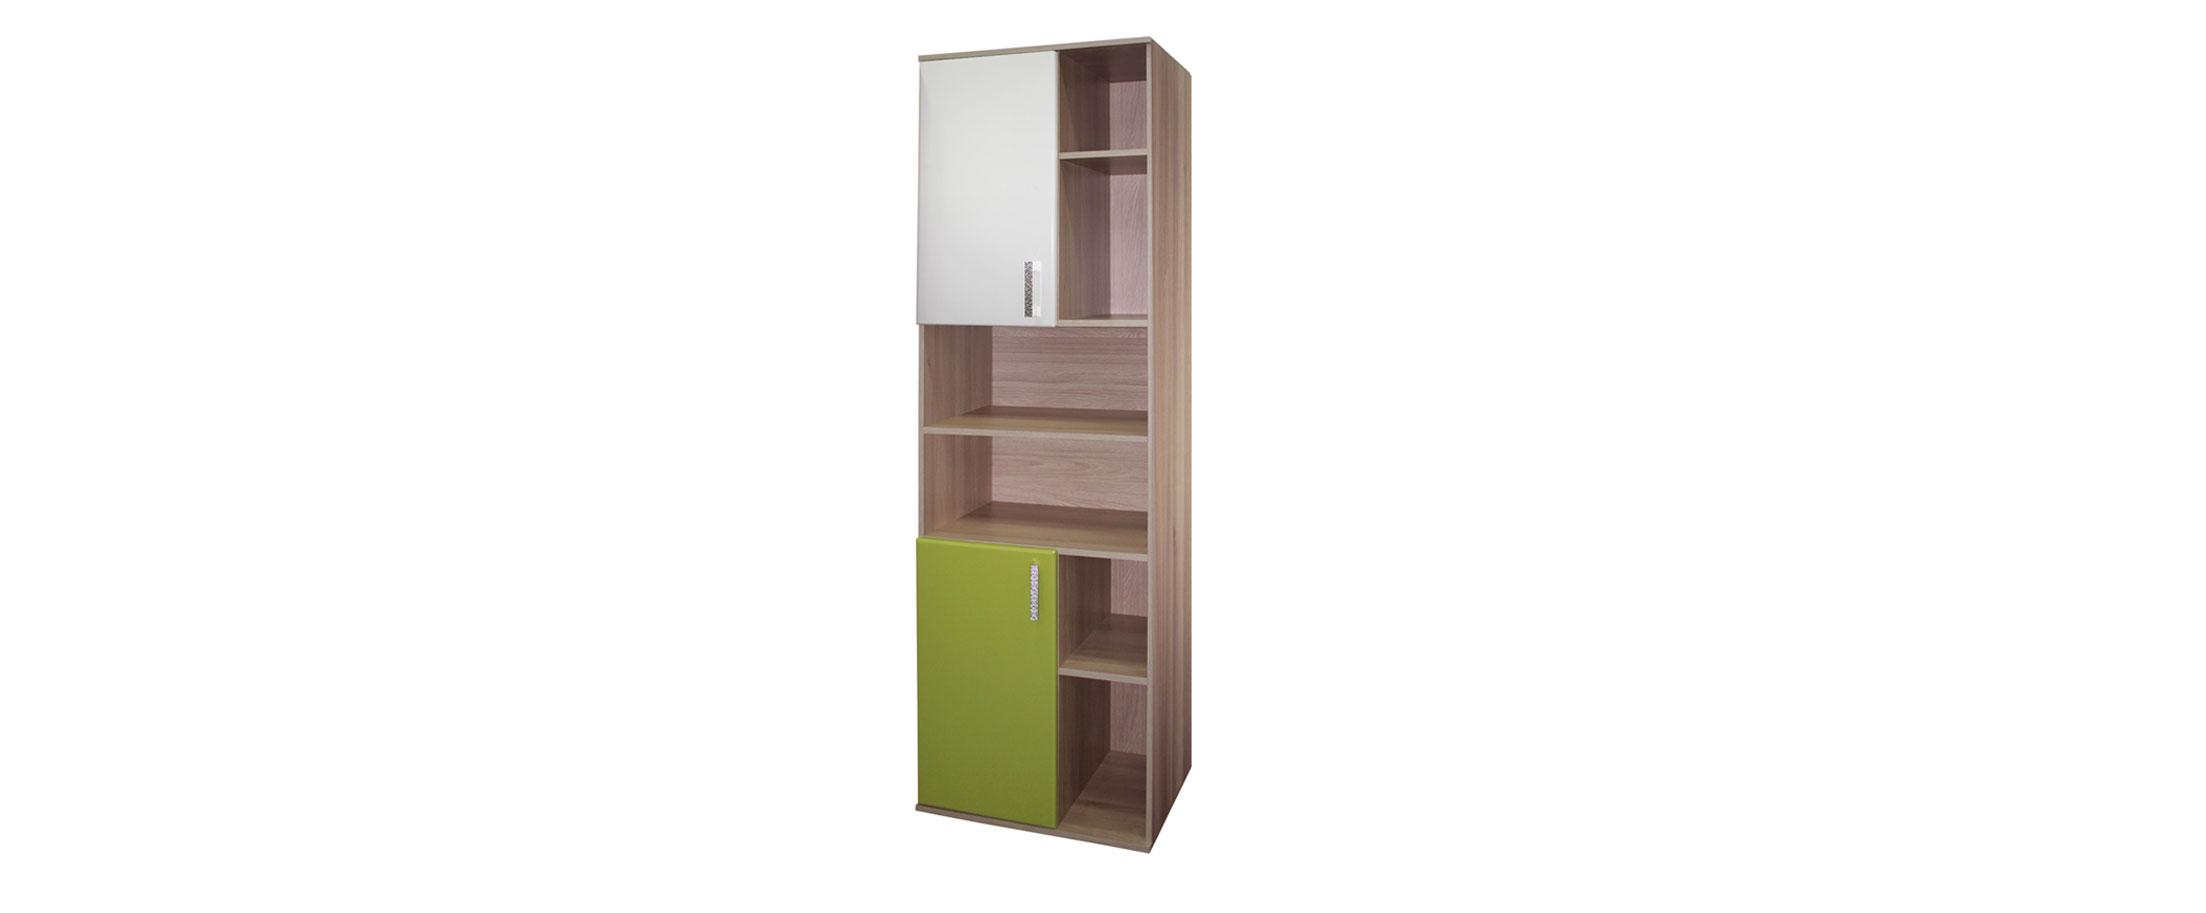 Шкаф для книг Дебют-2 Модель 507 от MOON TRADE